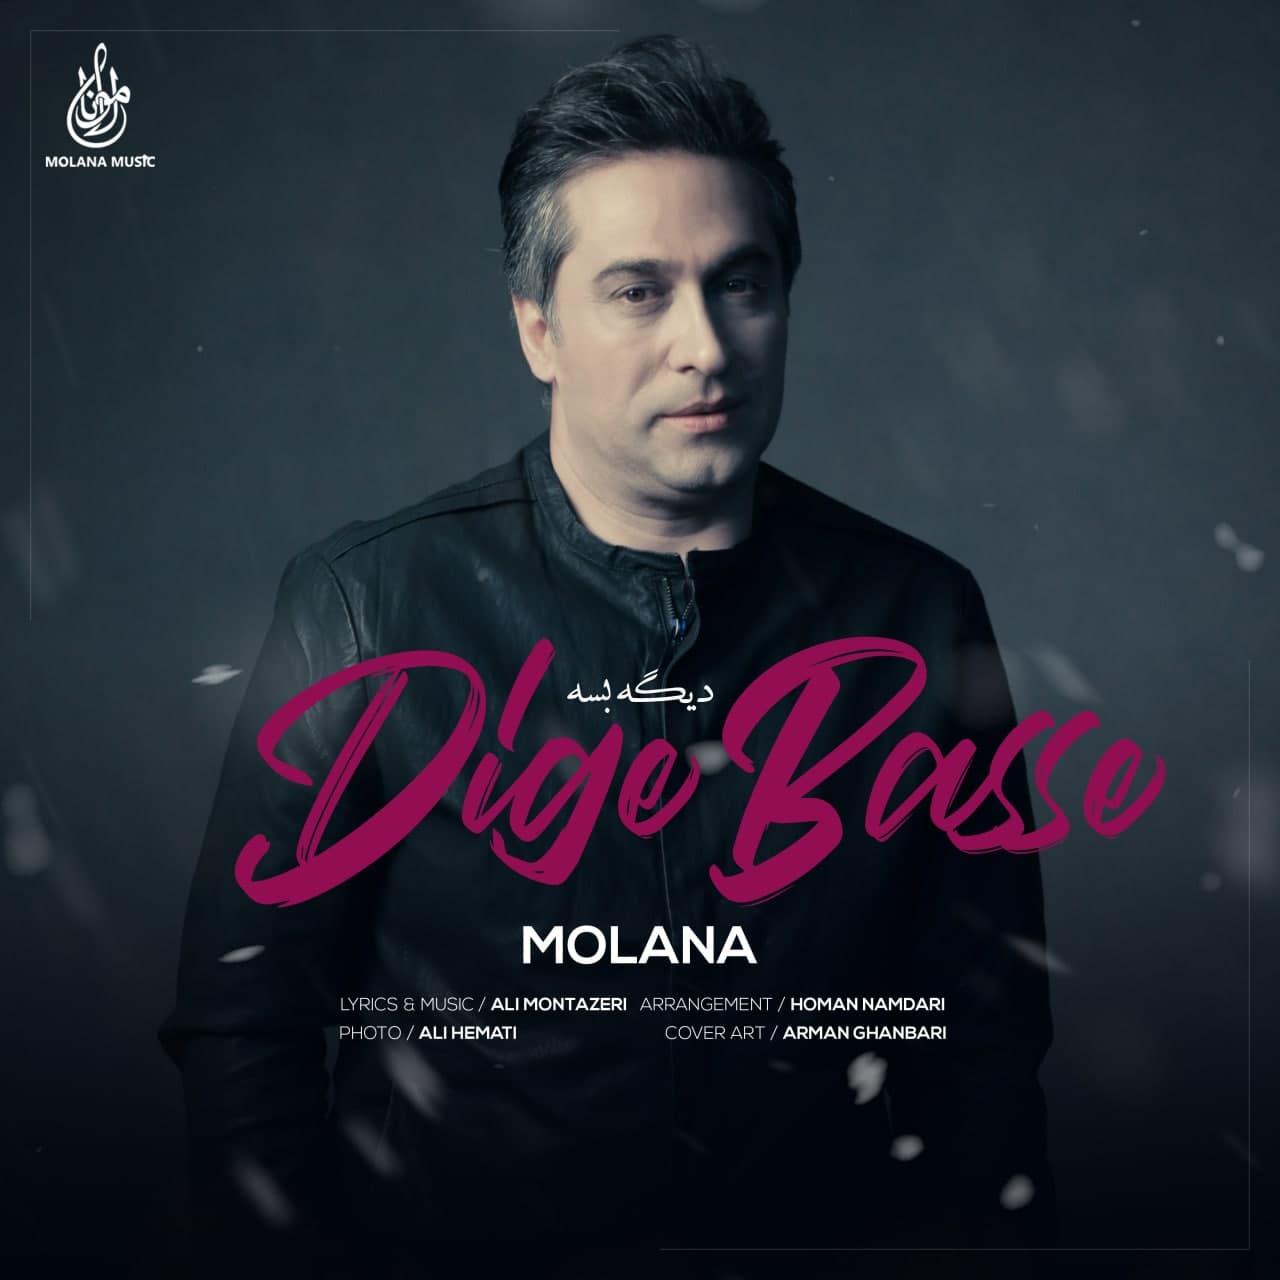 Molana – Dige Basse